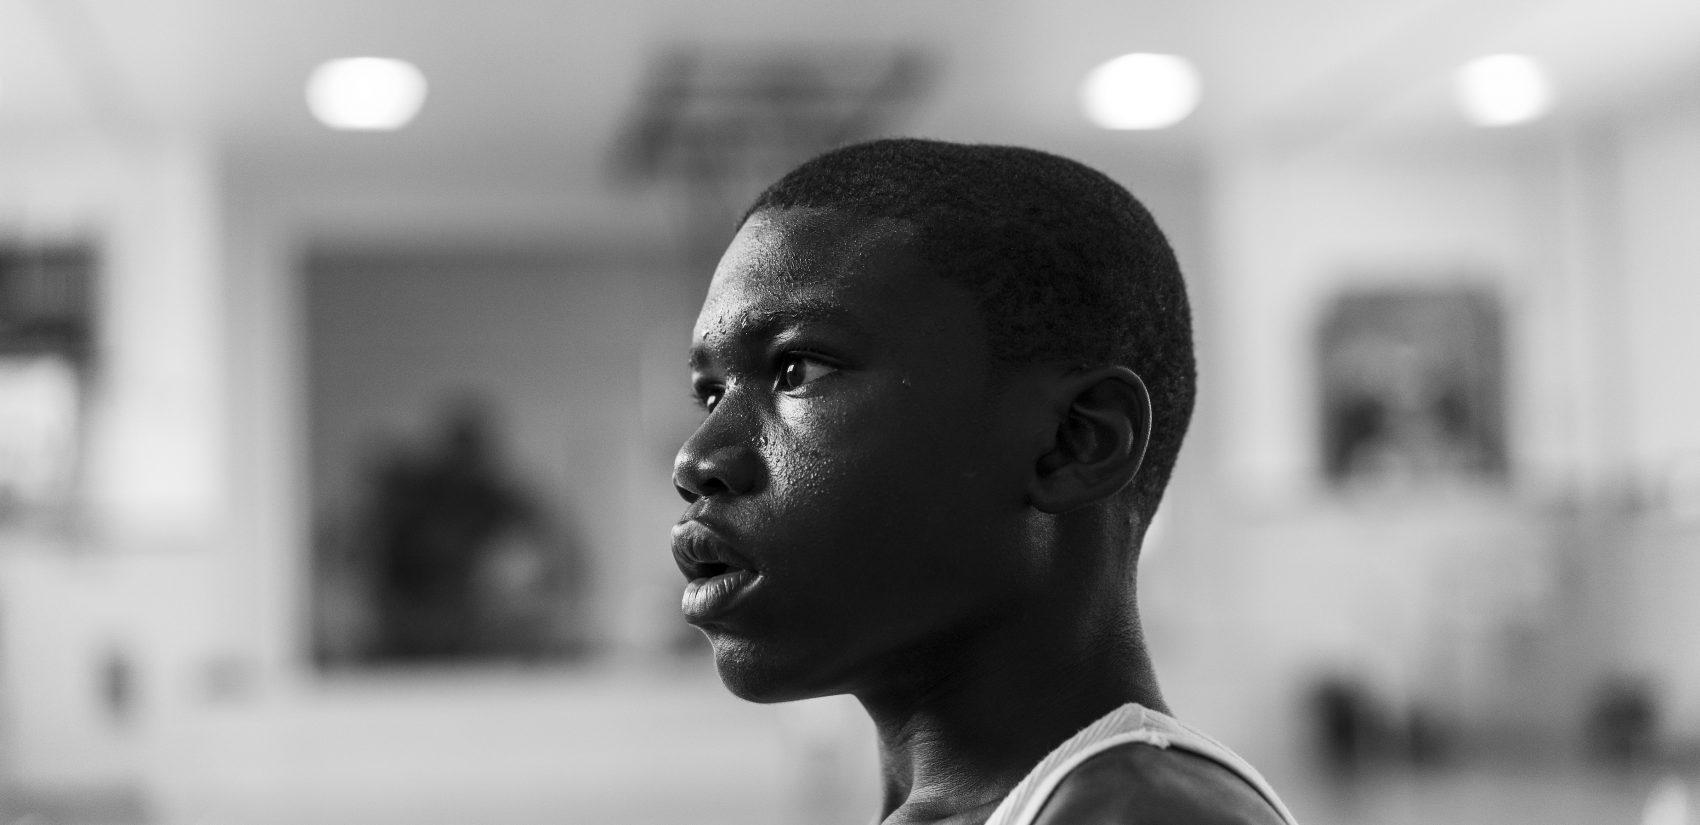 Qu-ran, 13, at basketball practice at Gathers. (Jessica Kourkounis for Keystone Crossroads)